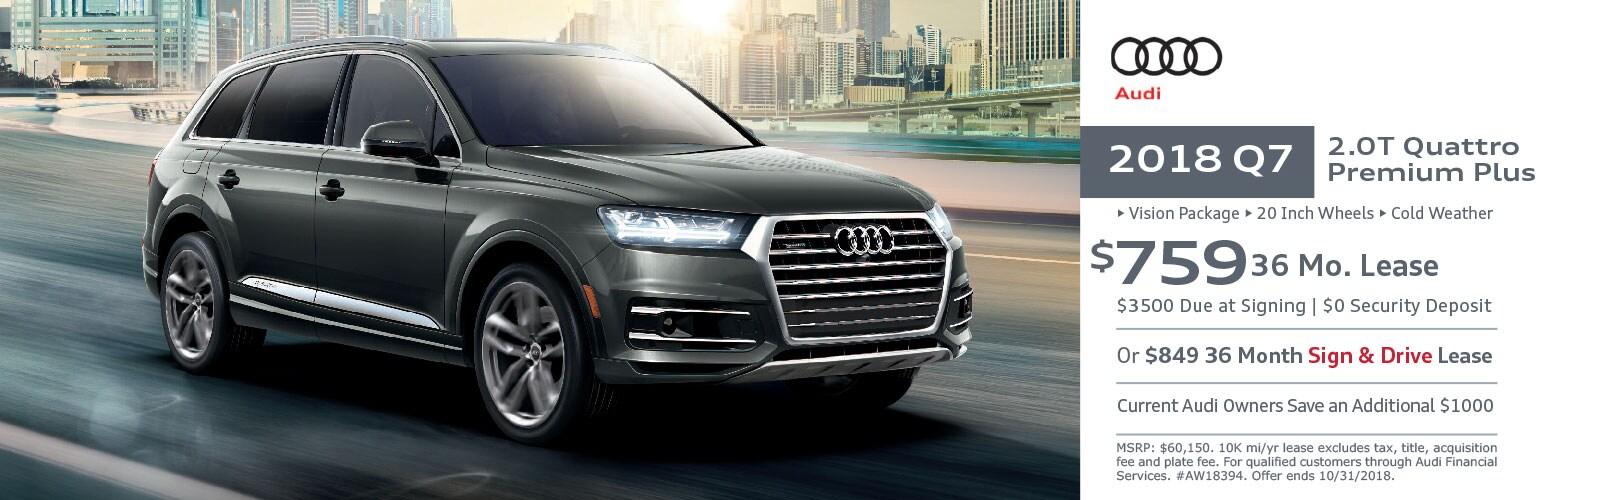 Cochran Audi Of Washington New Used Luxury Car Dealership - Audi pittsburgh